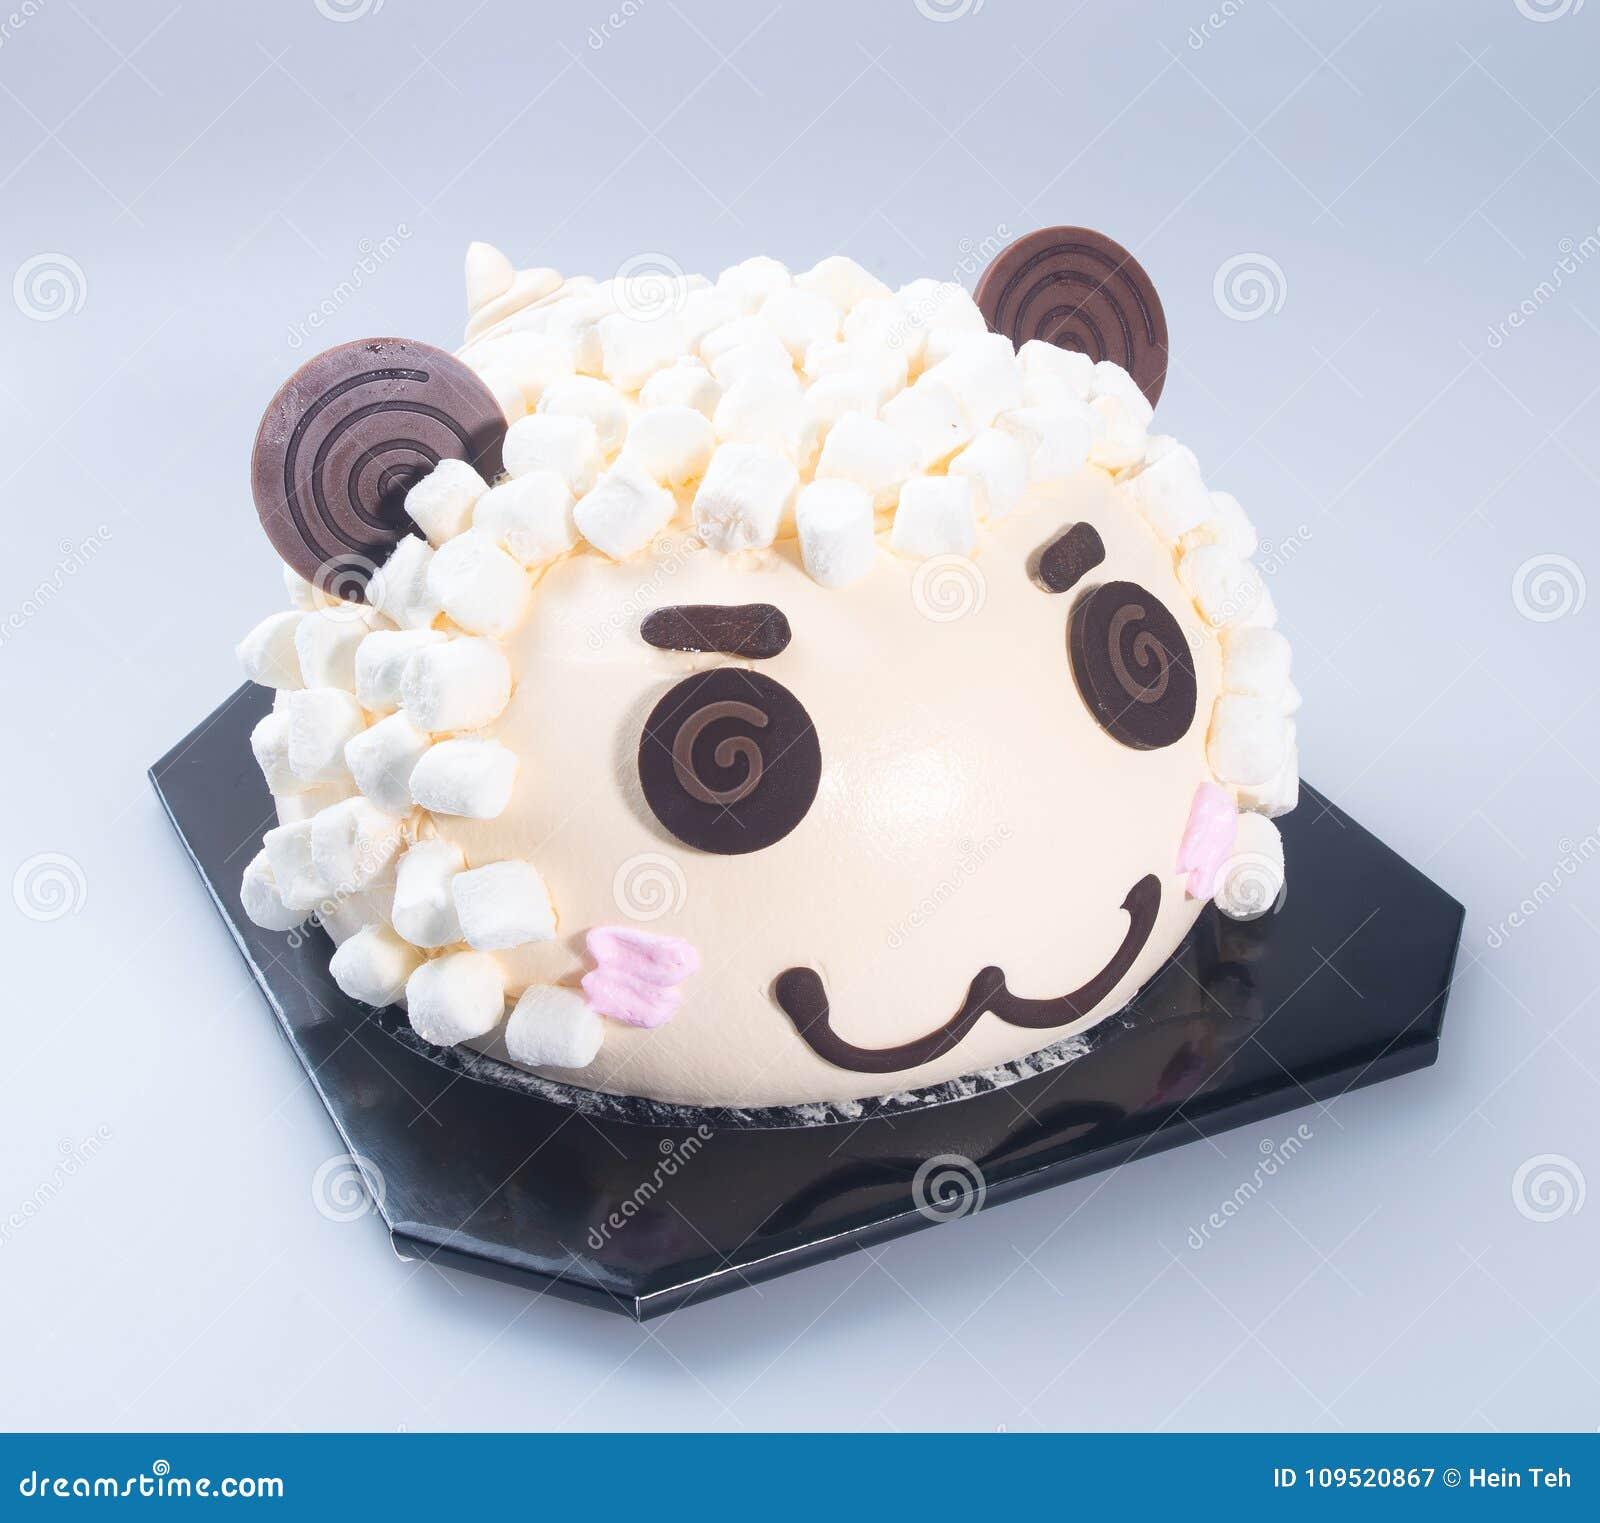 Cake Or Sheep Birthday Cake On A Background Stock Image Image Of